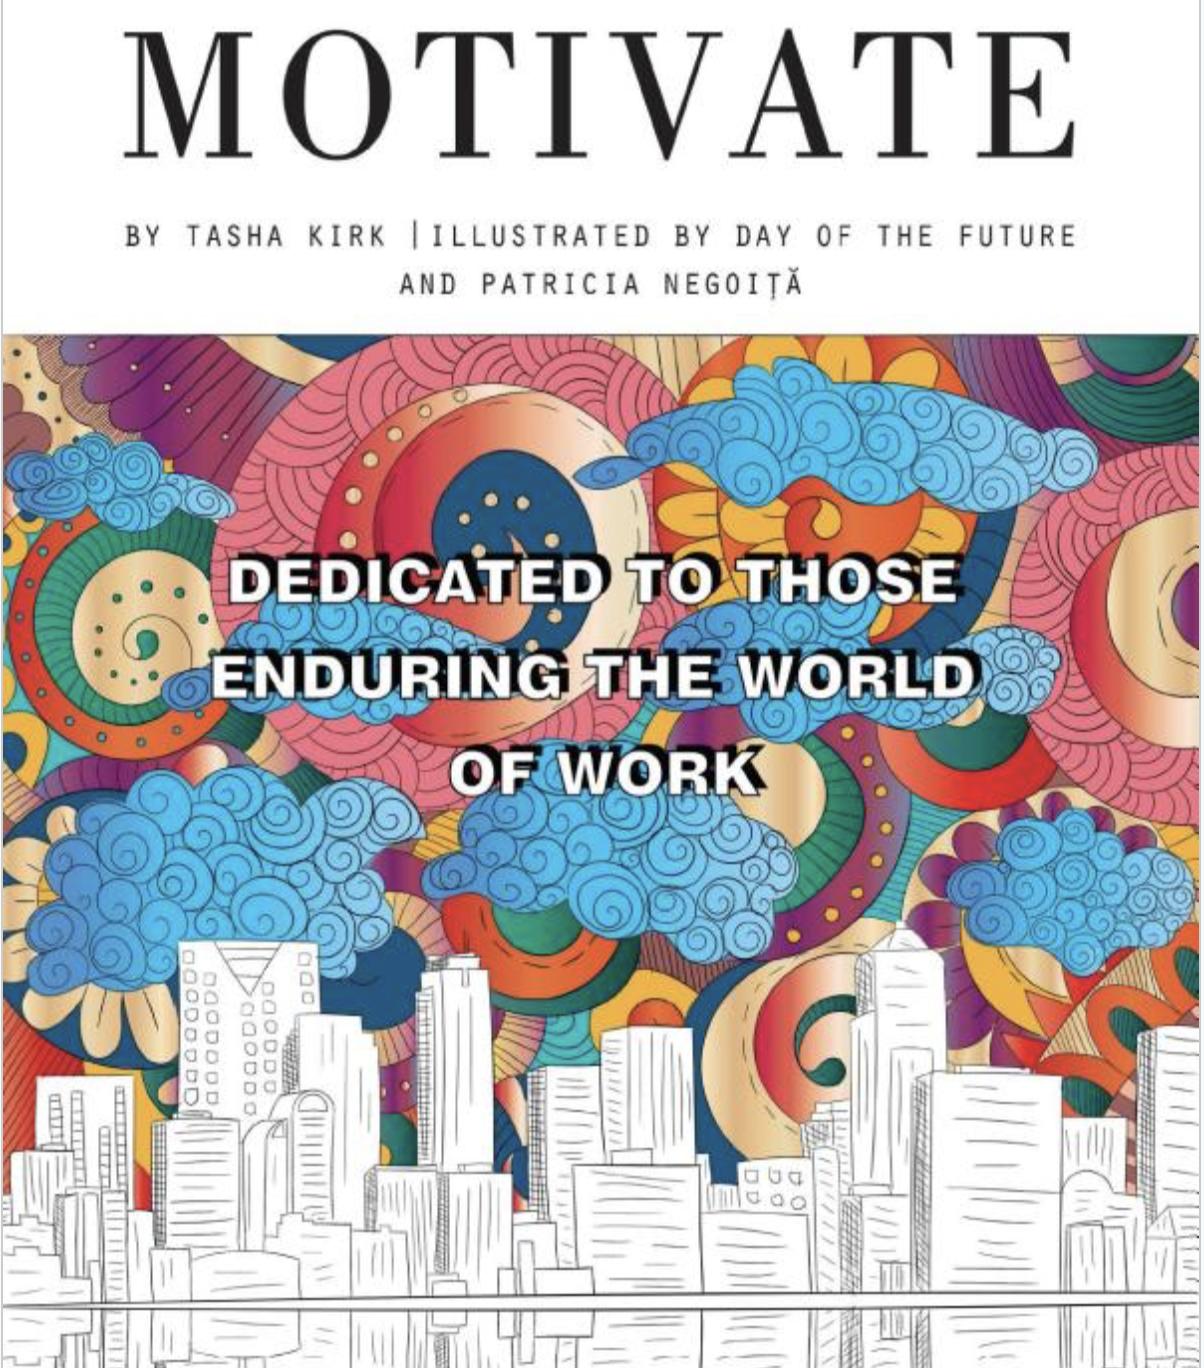 MOTIVATE: Tasha Kirk's Inspiring and Relaxing New Book